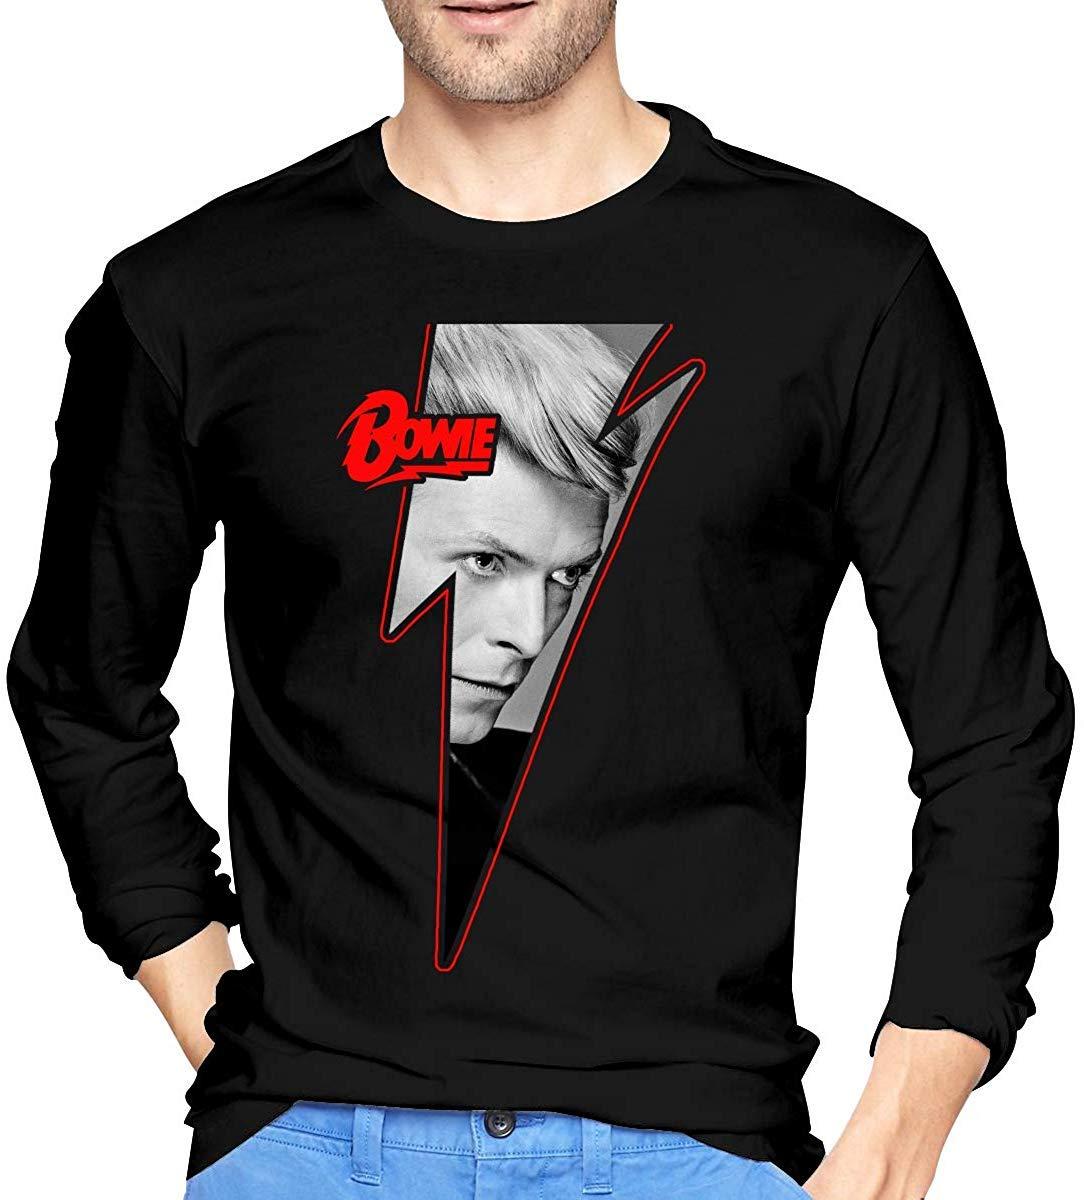 David Bowie Black Shirts